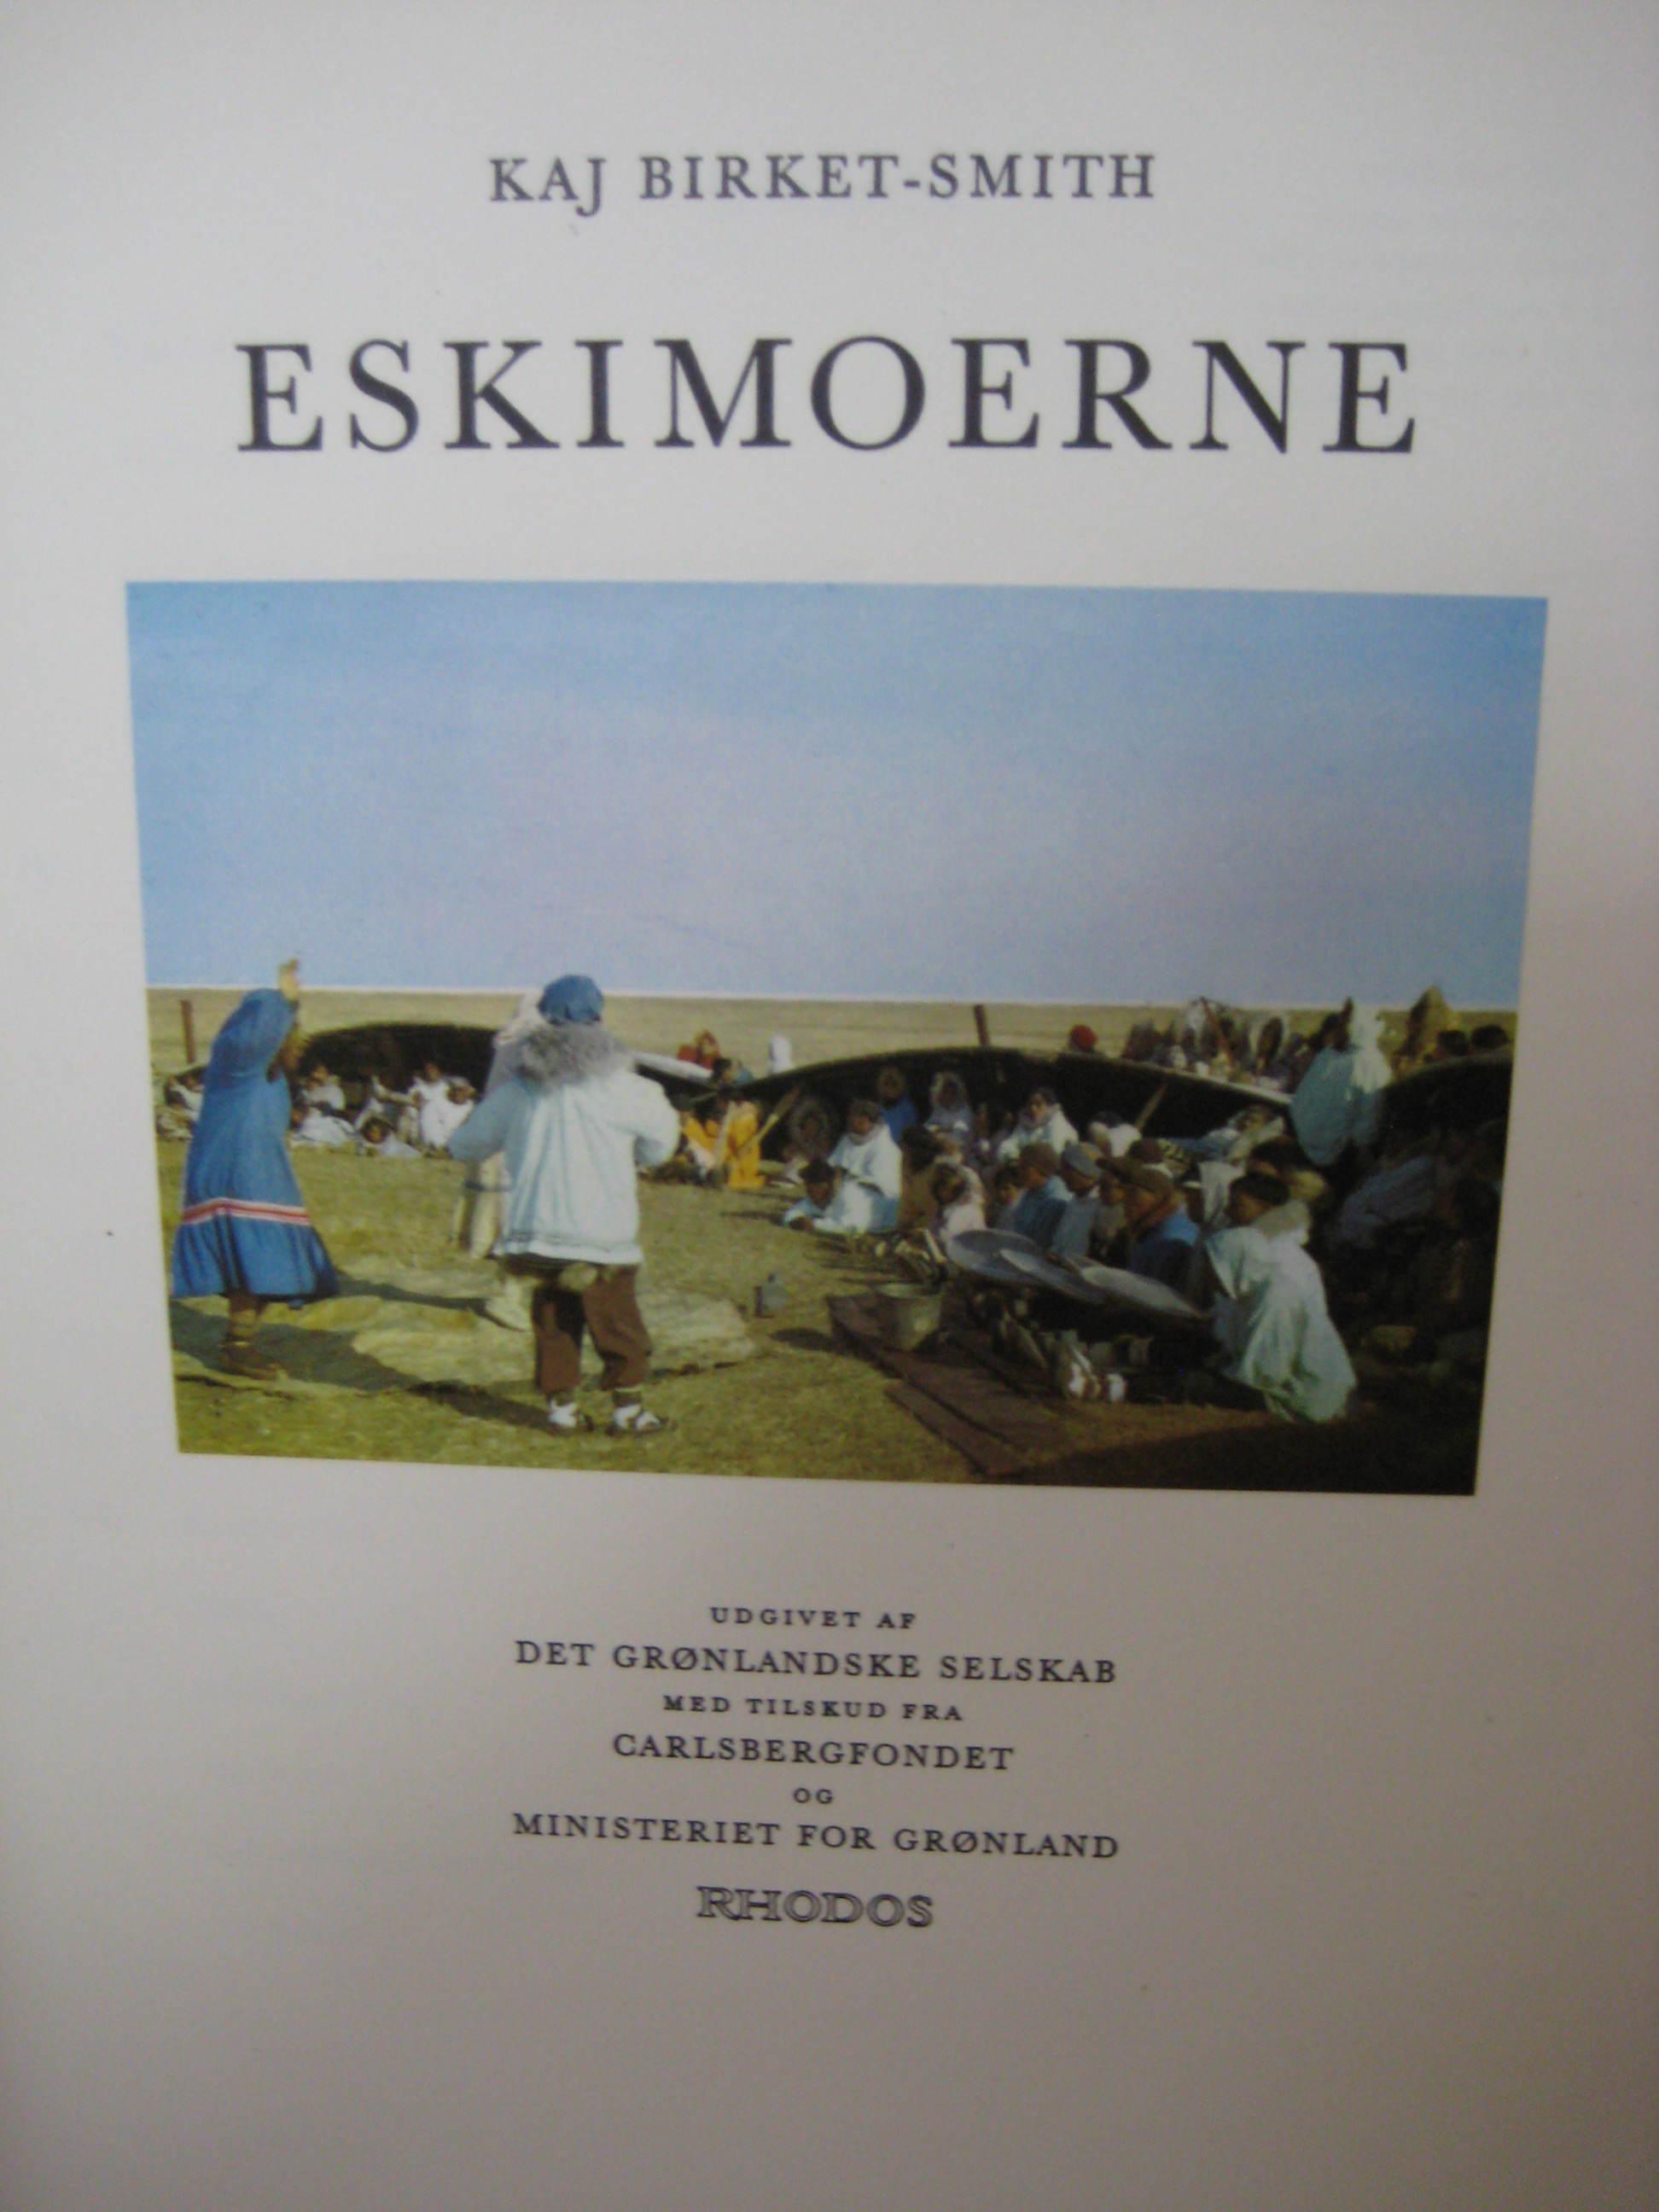 Eskimoerne